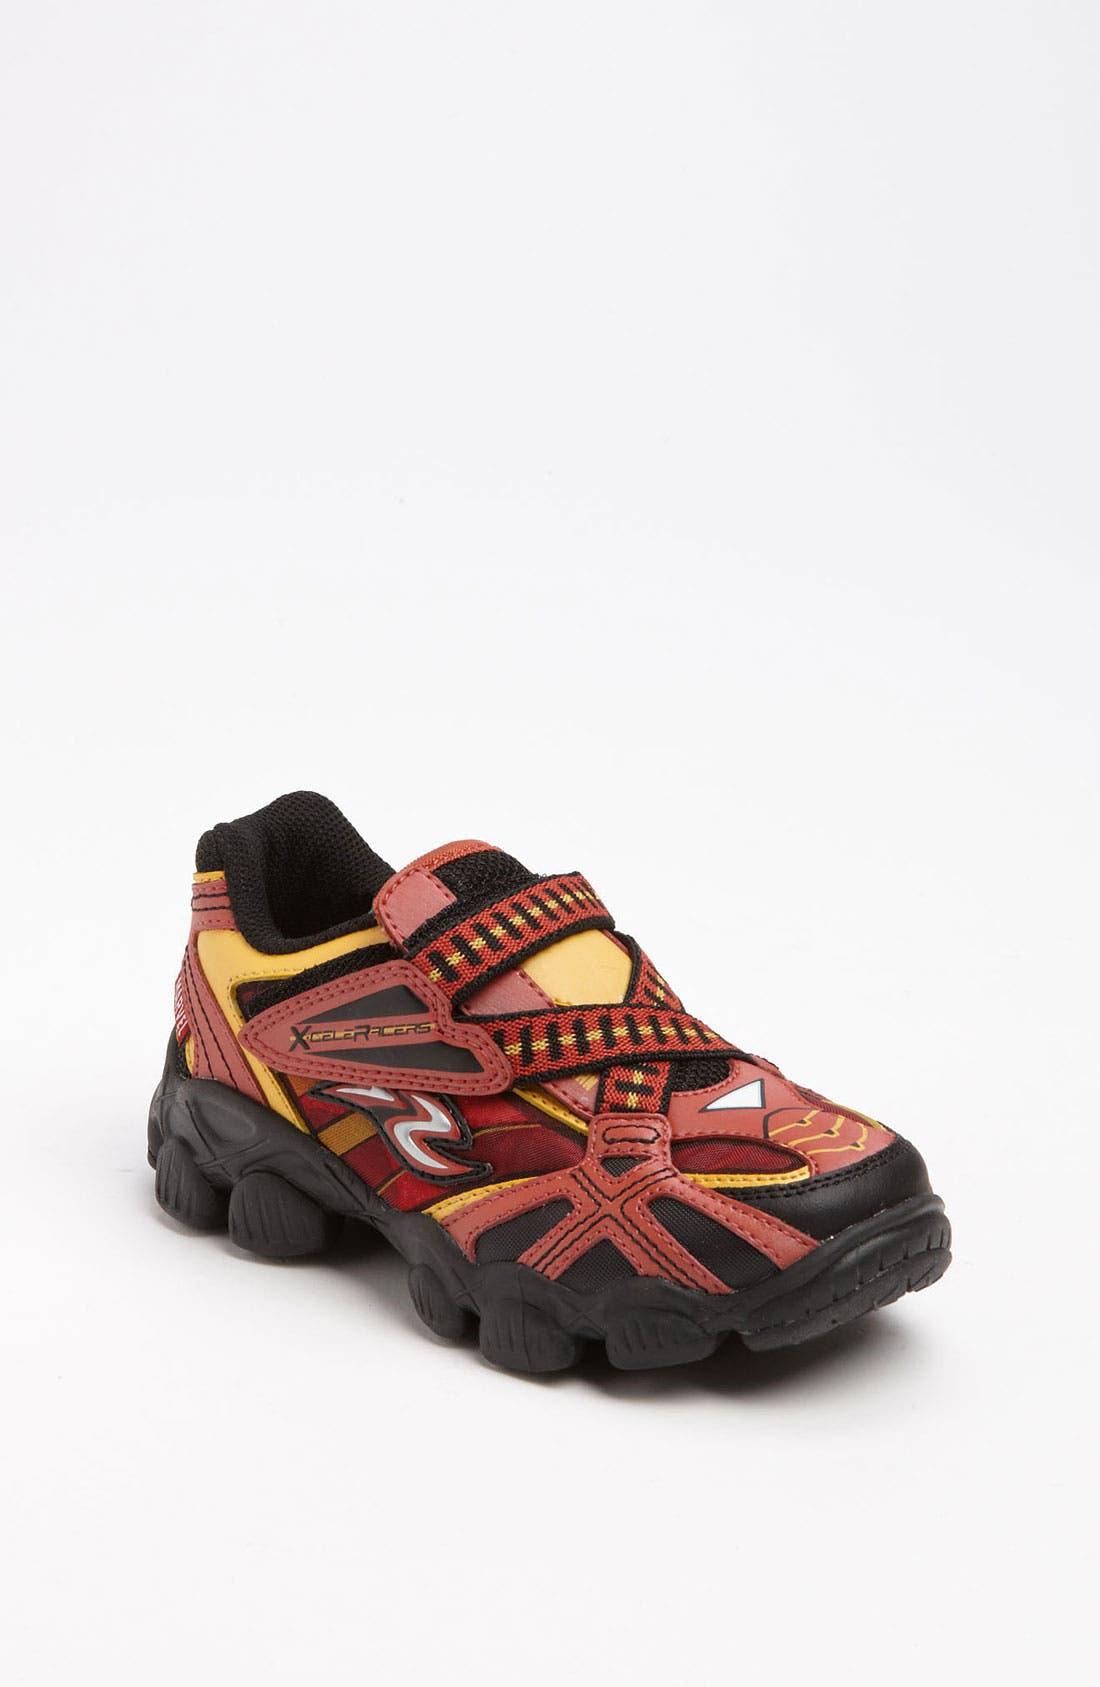 Main Image - Stride Ride 'X-Celeracers Iron Man®' Sneaker (Toddler & Little Kid)